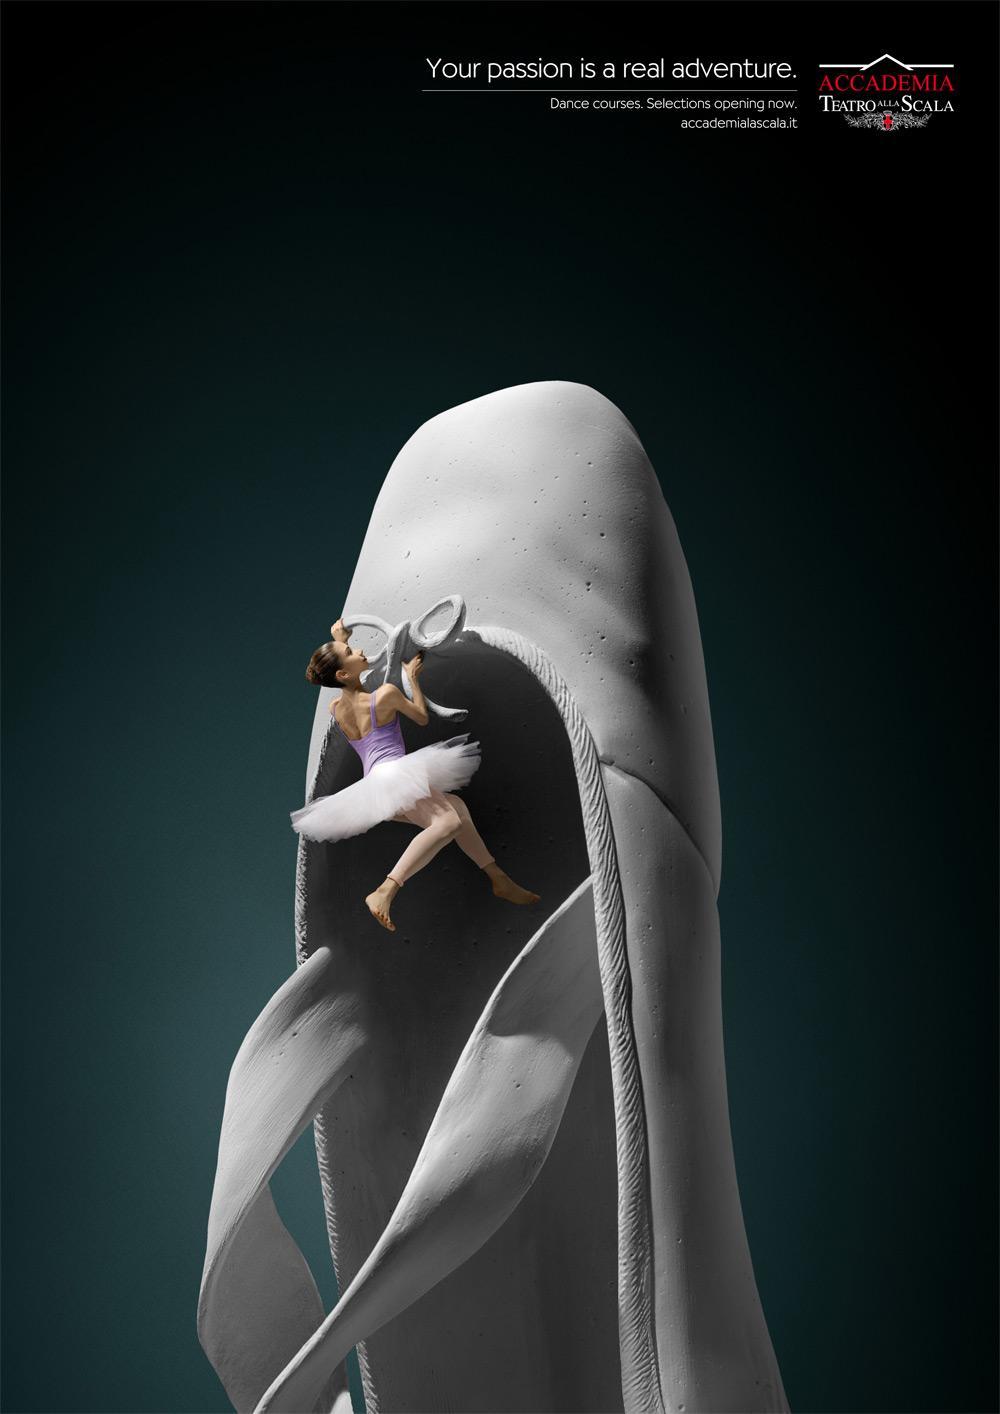 Accademia Teatro alla Scala Print Ad -  The climb, Ballet